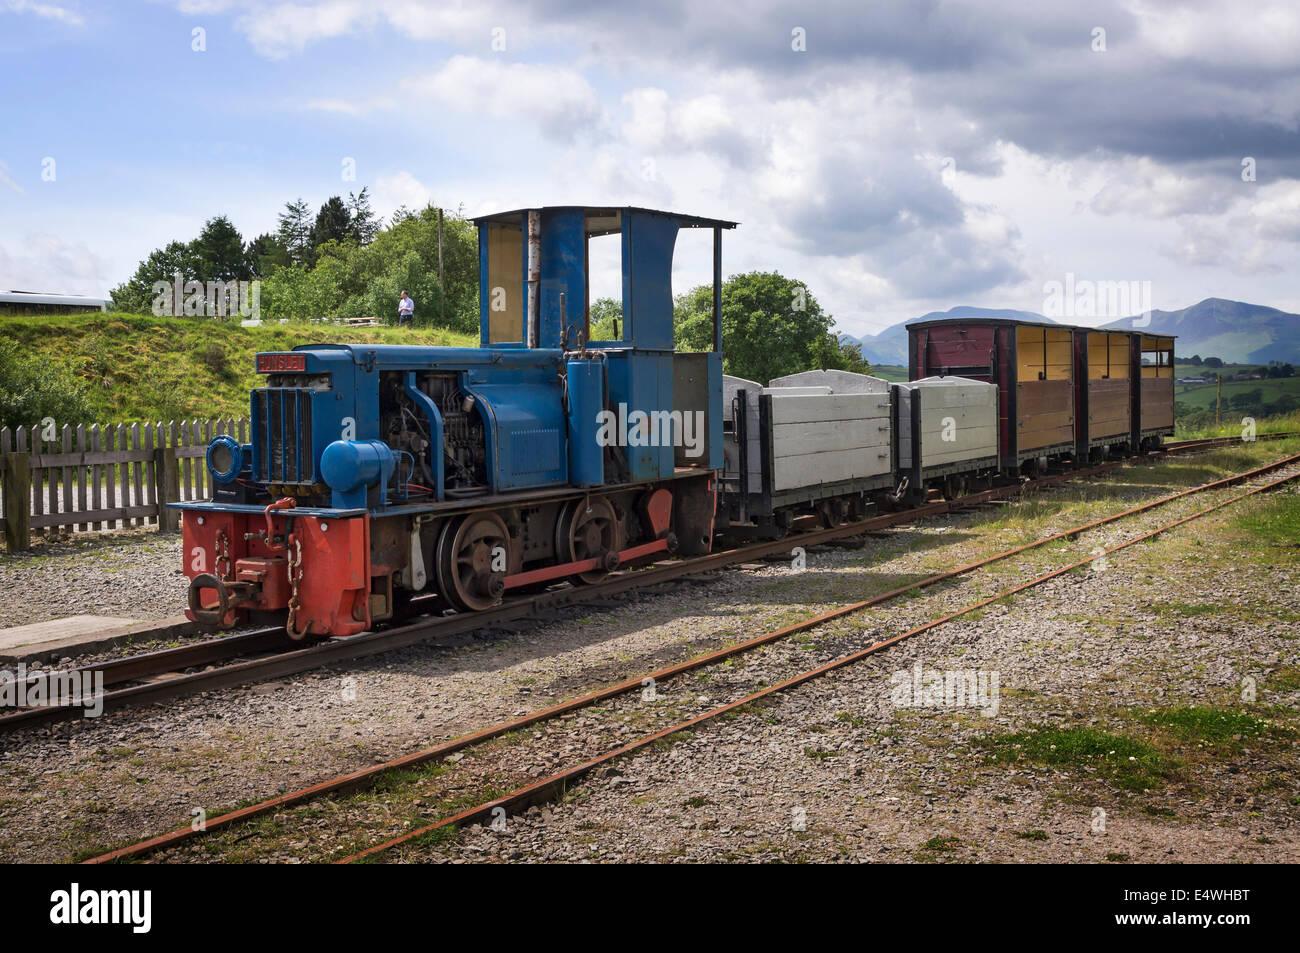 Quarry train at the Threlkeld Mining Museum, Cumbria, UK - Stock Image